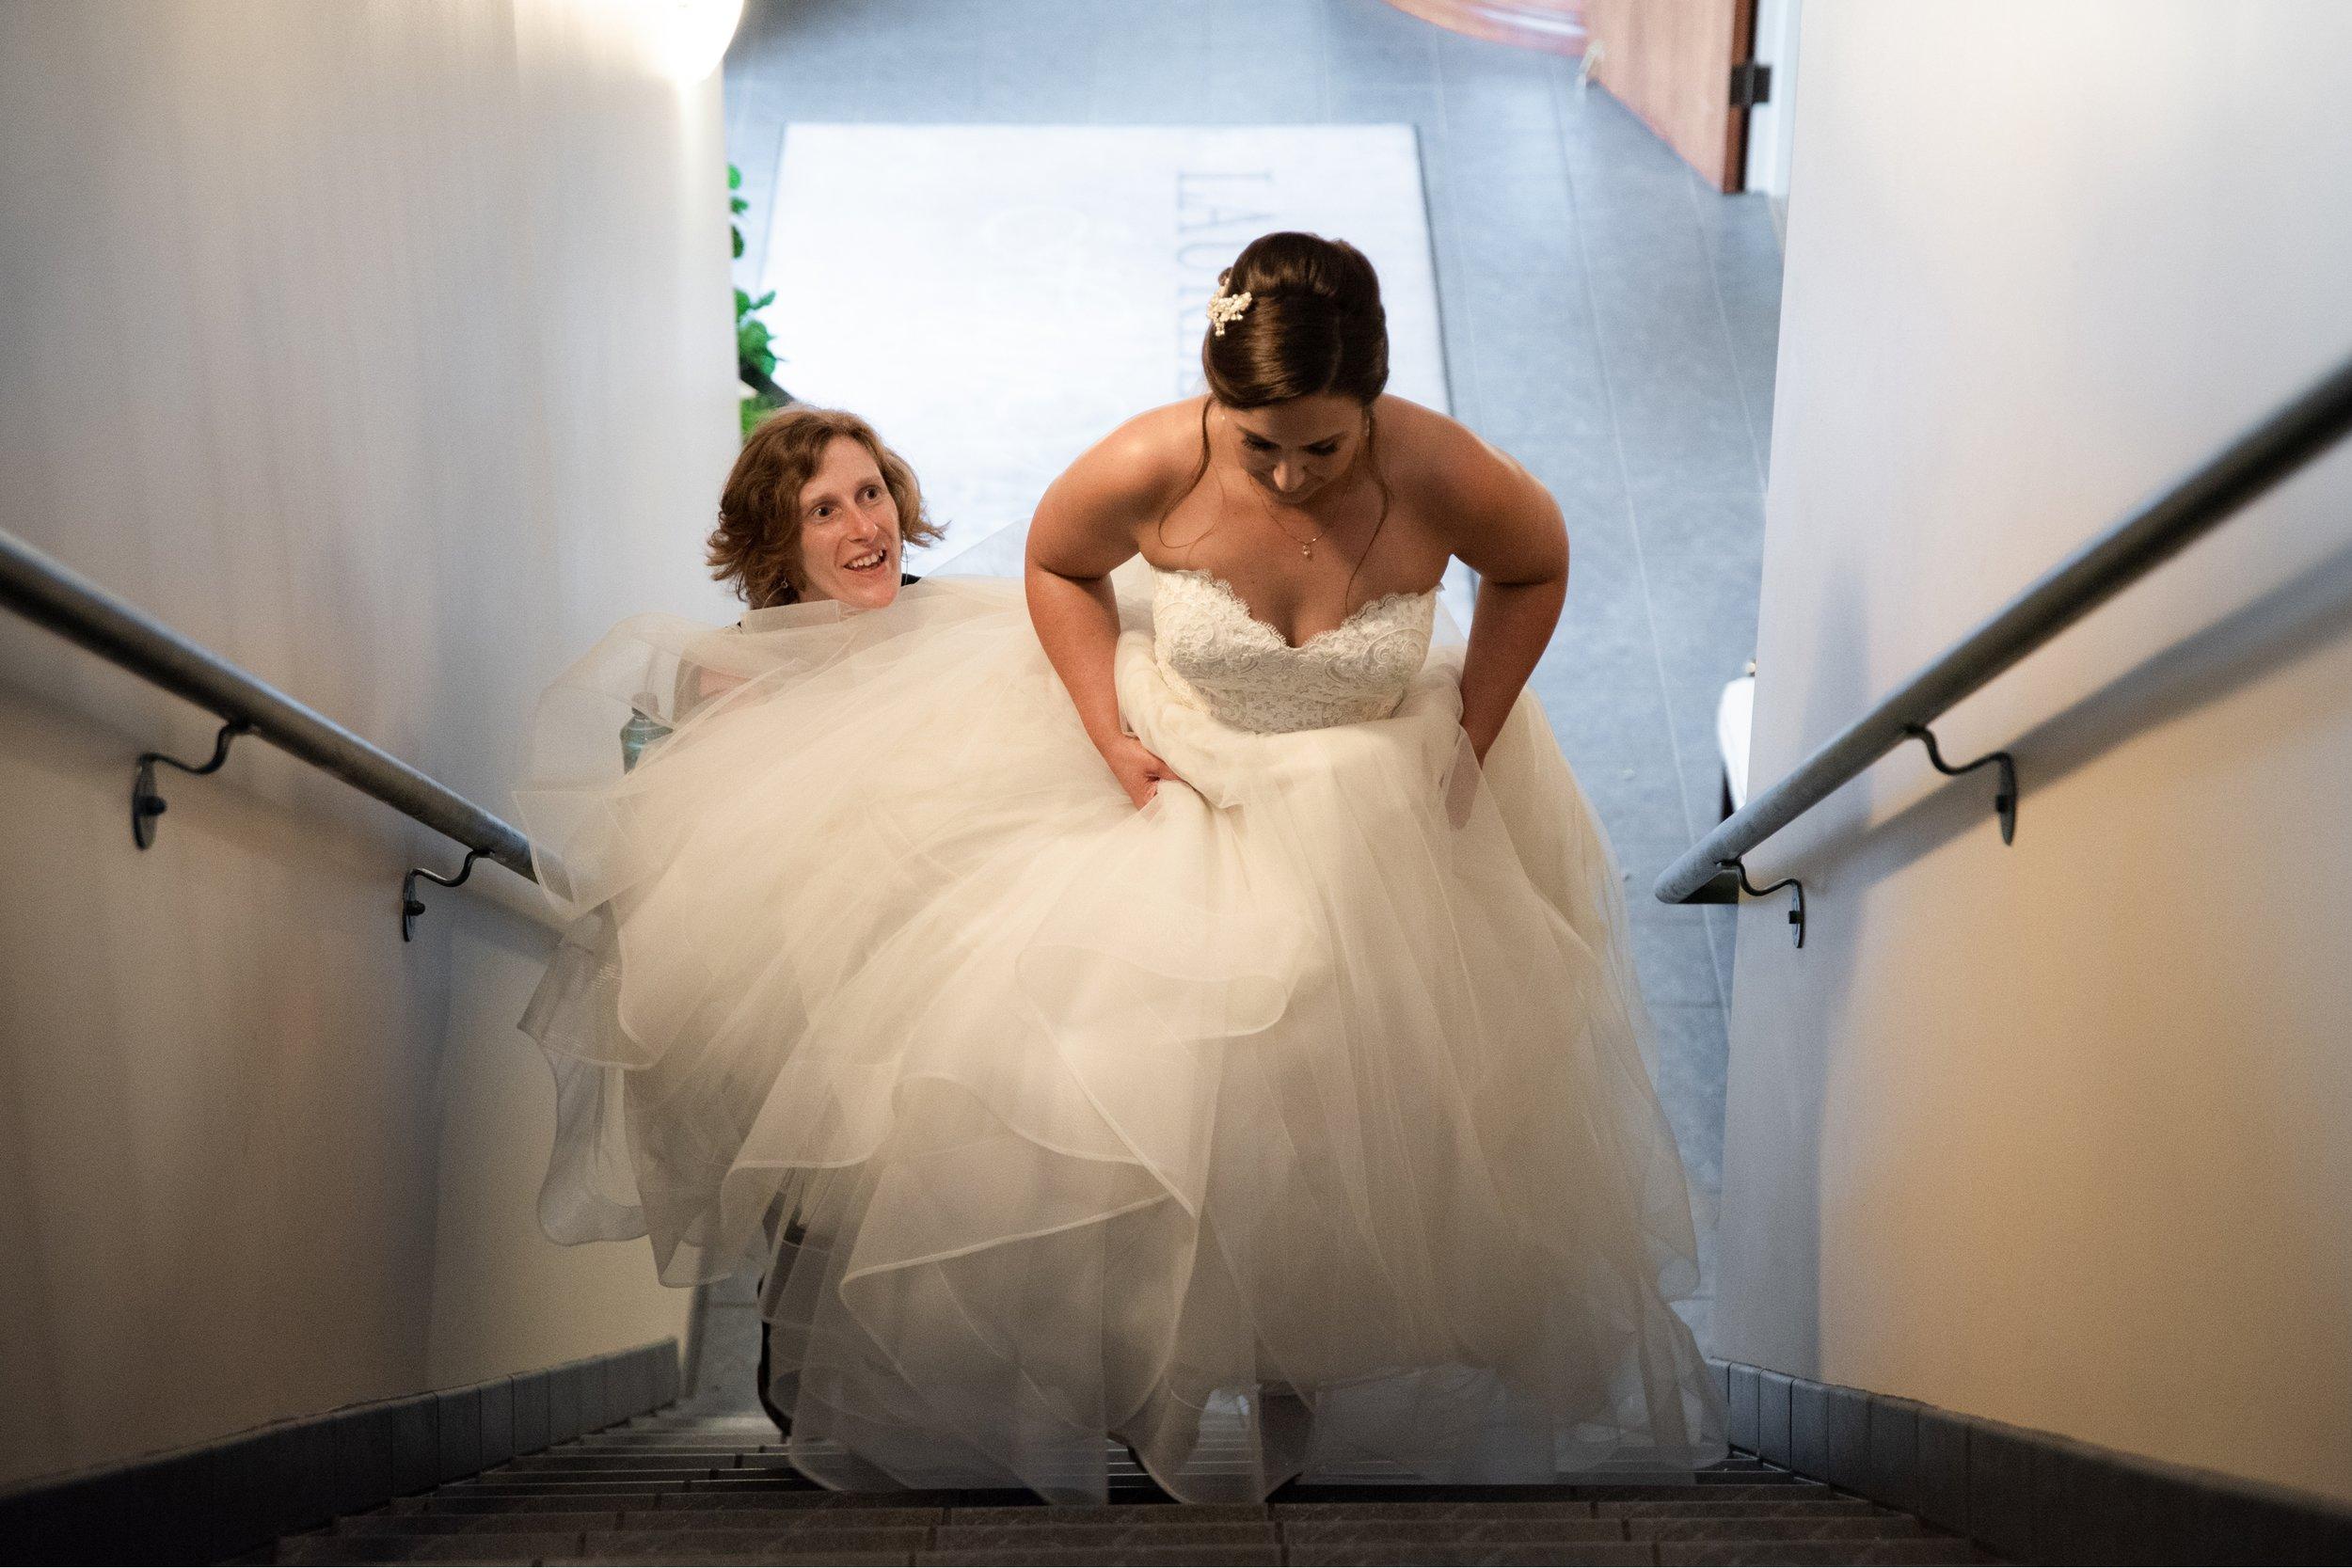 High Vista Weddings - Asheville Wedding 2 7.jpg